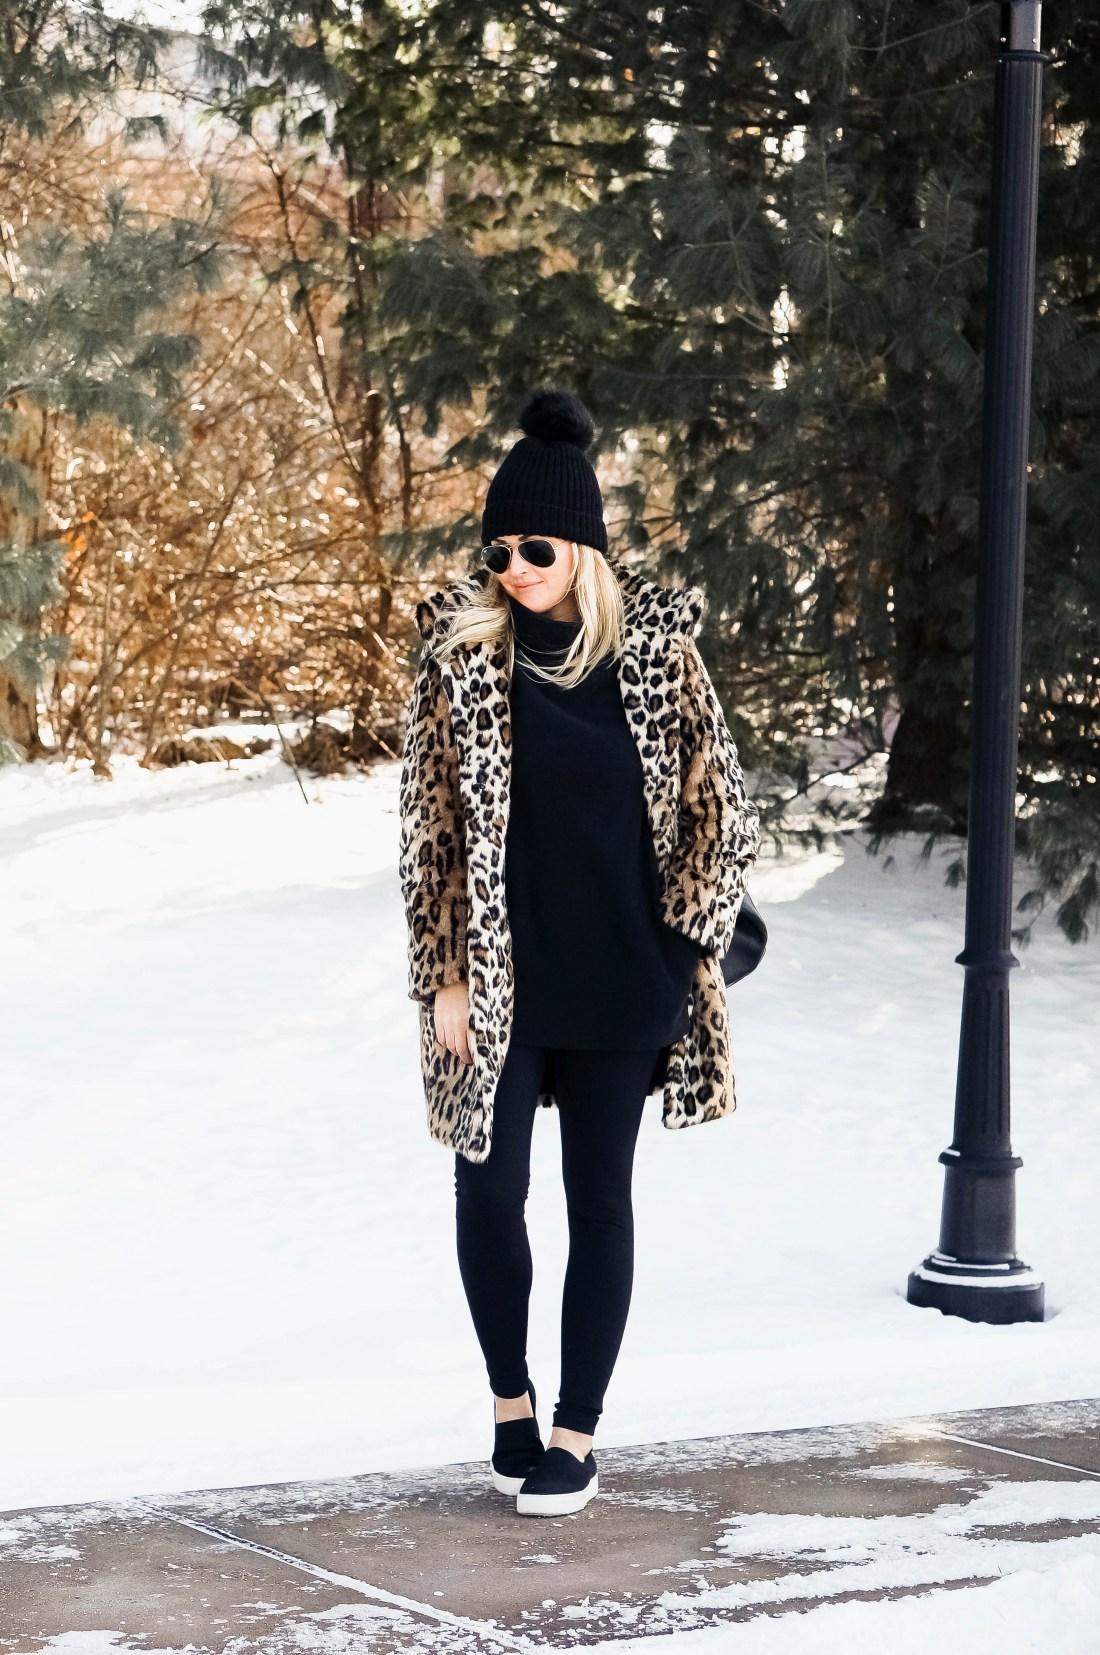 How To Wear A Fur Leopard Coat